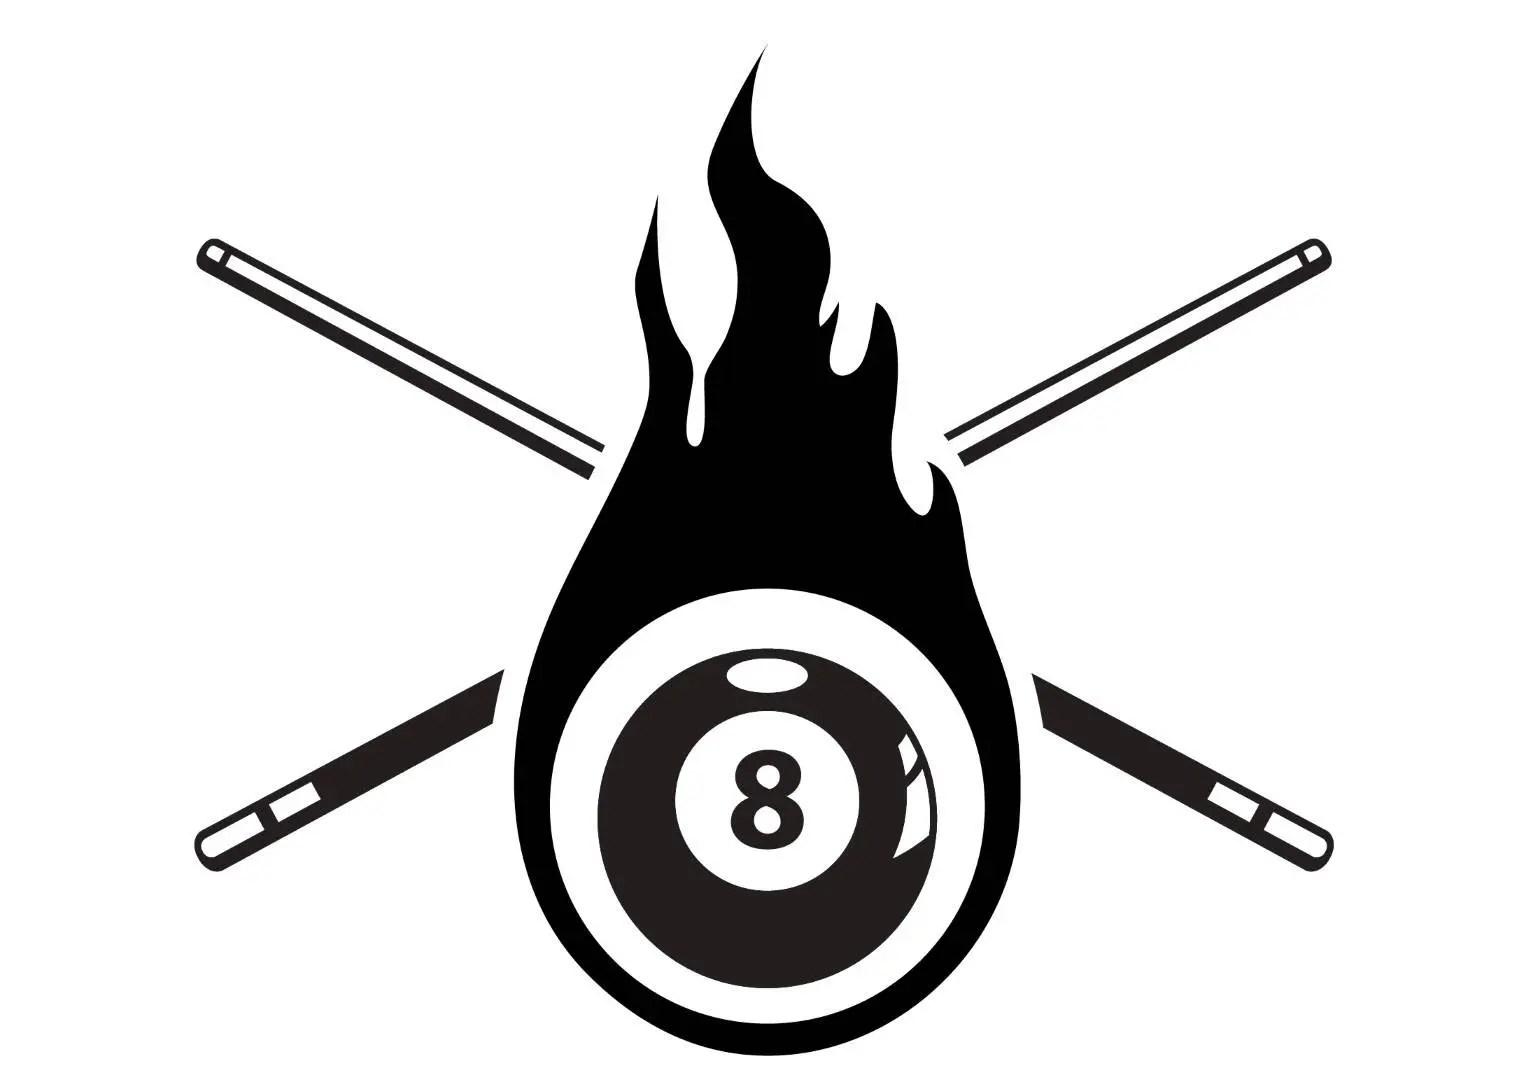 Billiards Pool Logo 1 Eight 8 Nine 9 Ball Stick Cue Sports